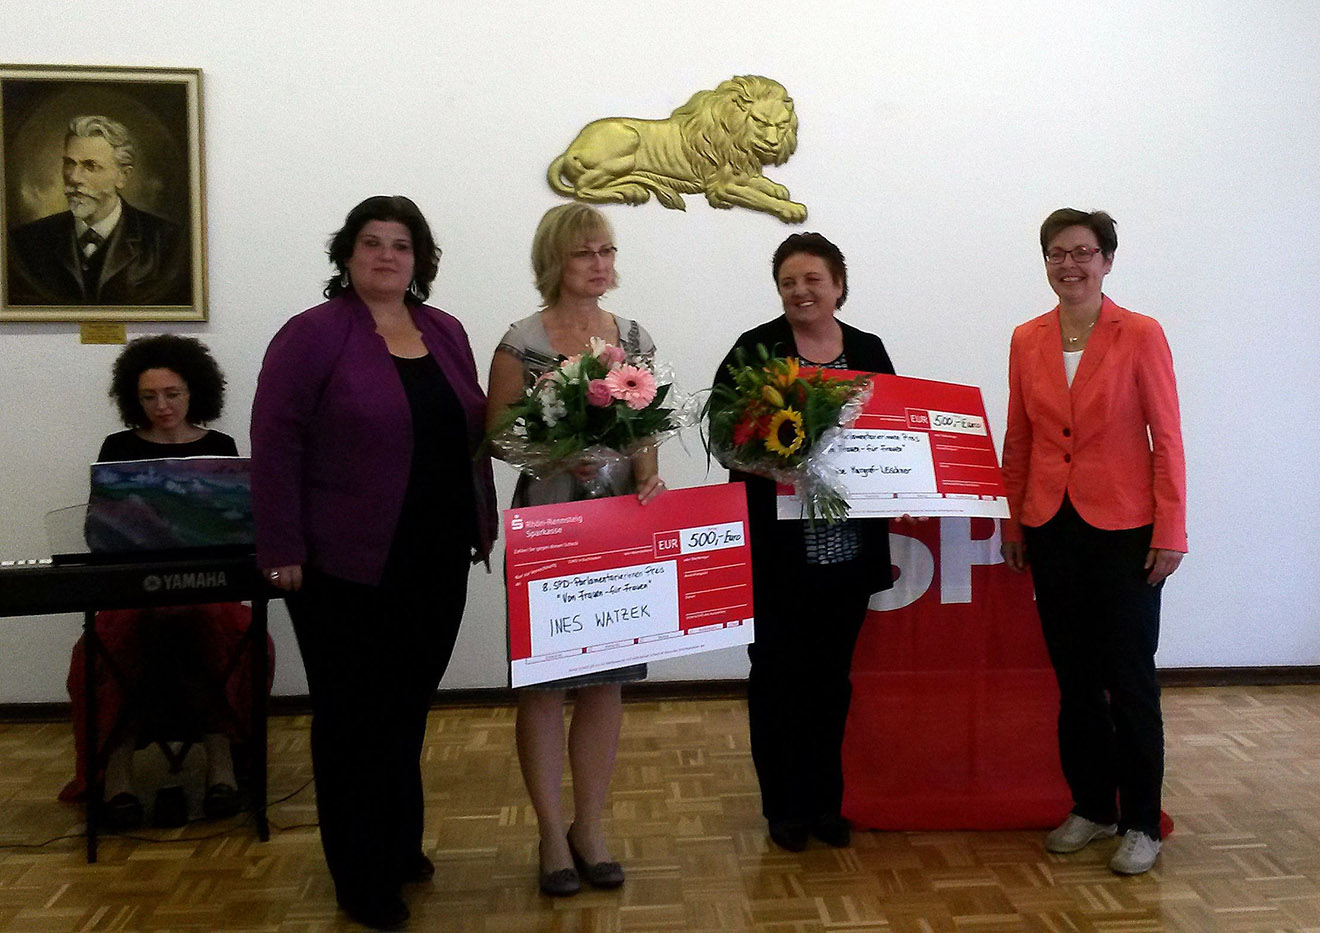 Greizerin Ines Watzek bekommt Frauenpreis